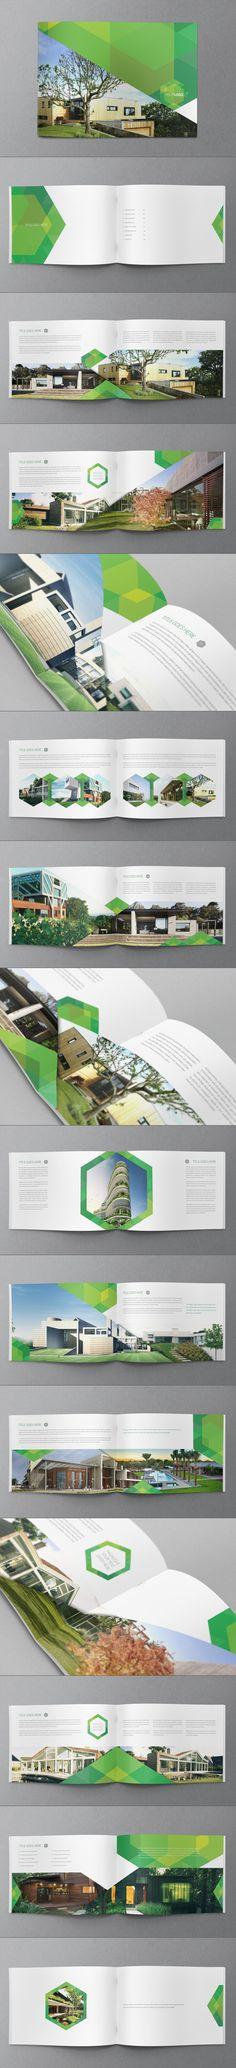 [Stools Brochure]  Ecologic Hexo Brochure by Abra Design, via Behance